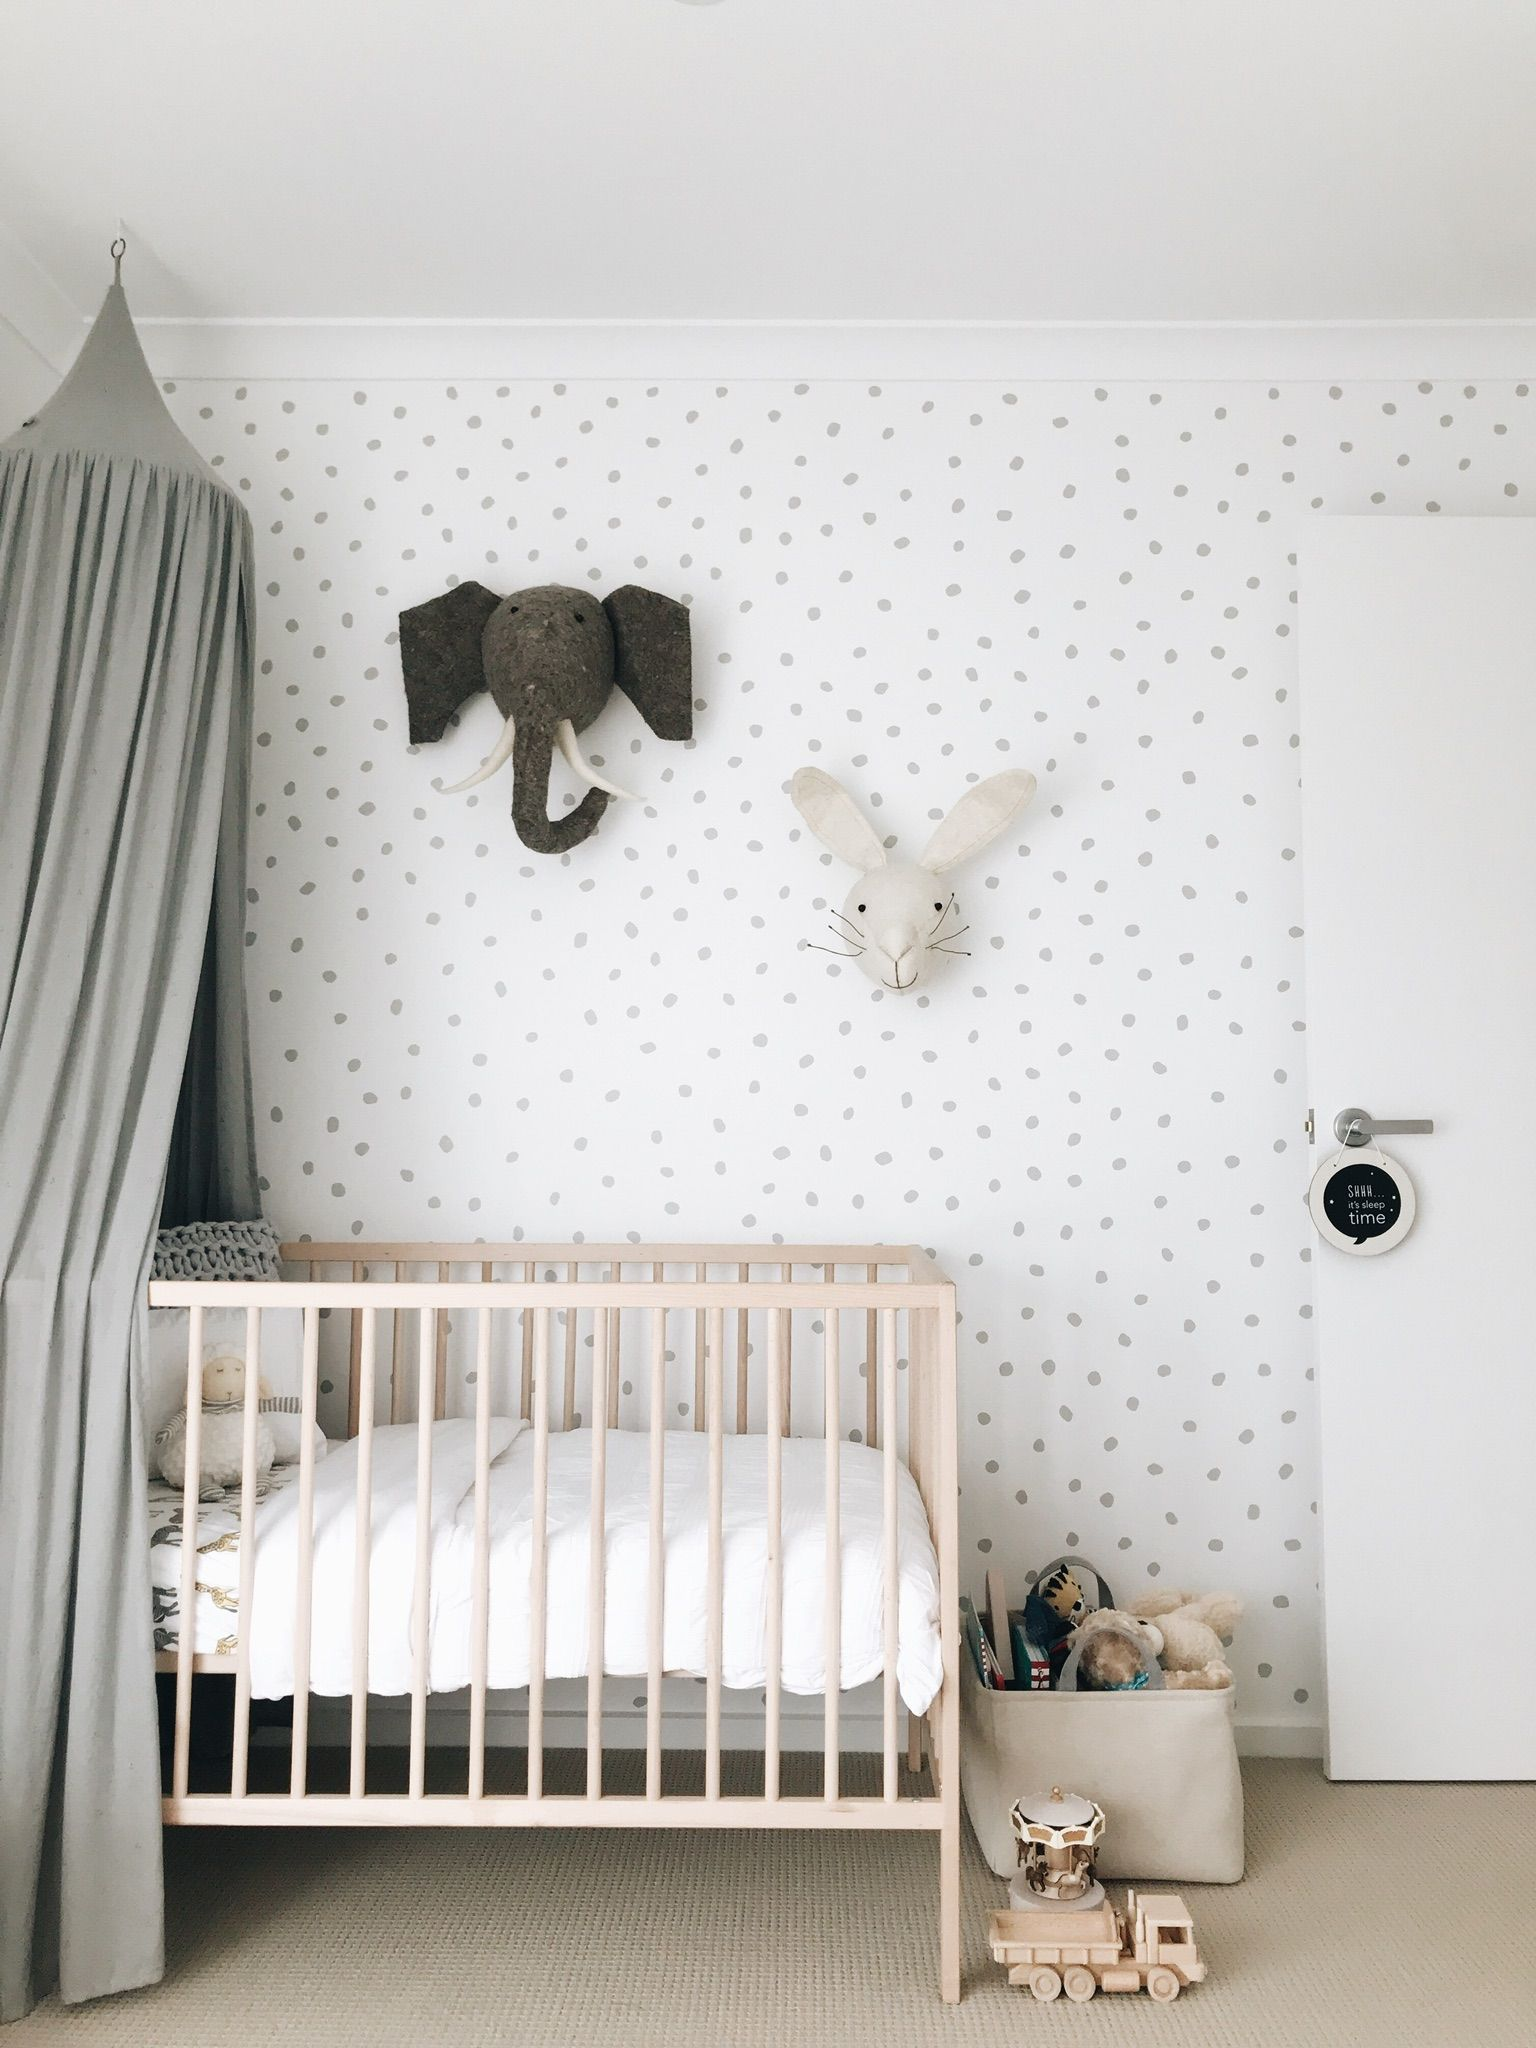 Irregular Dots  Nursery accent wall, Baby room design, Nursery